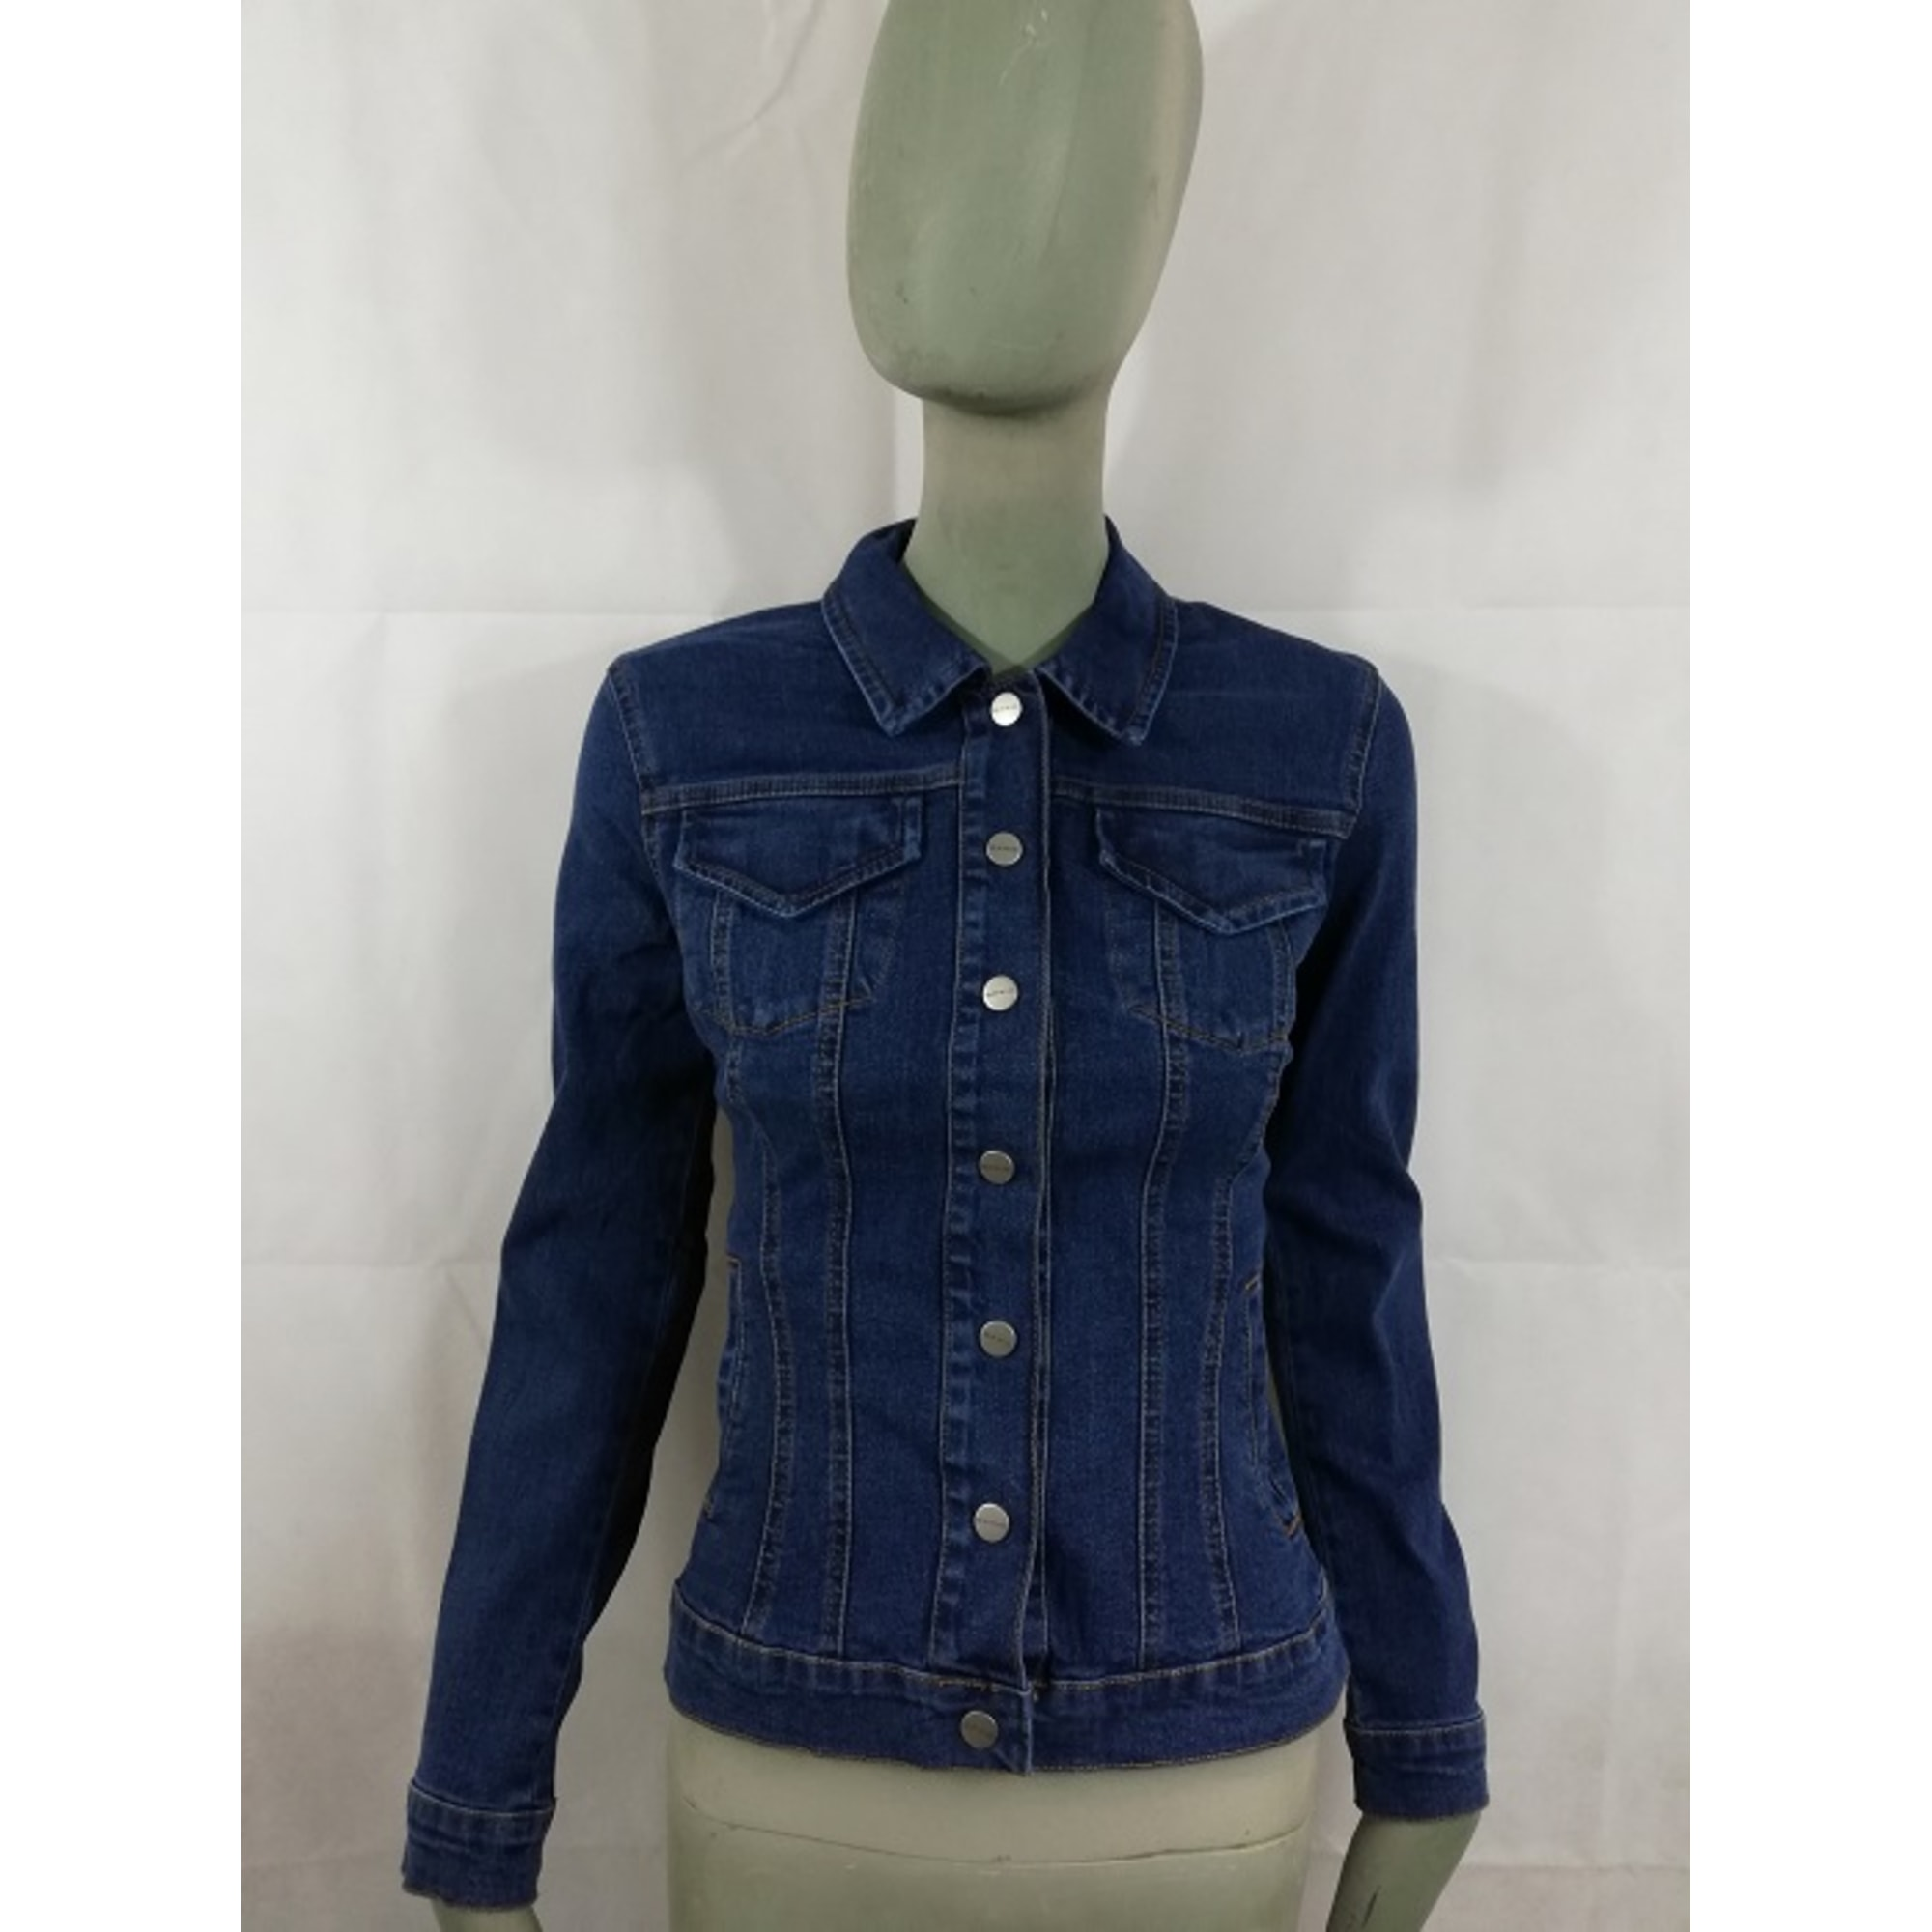 Blouson en jean OPPIO FASHION Bleu, bleu marine, bleu turquoise